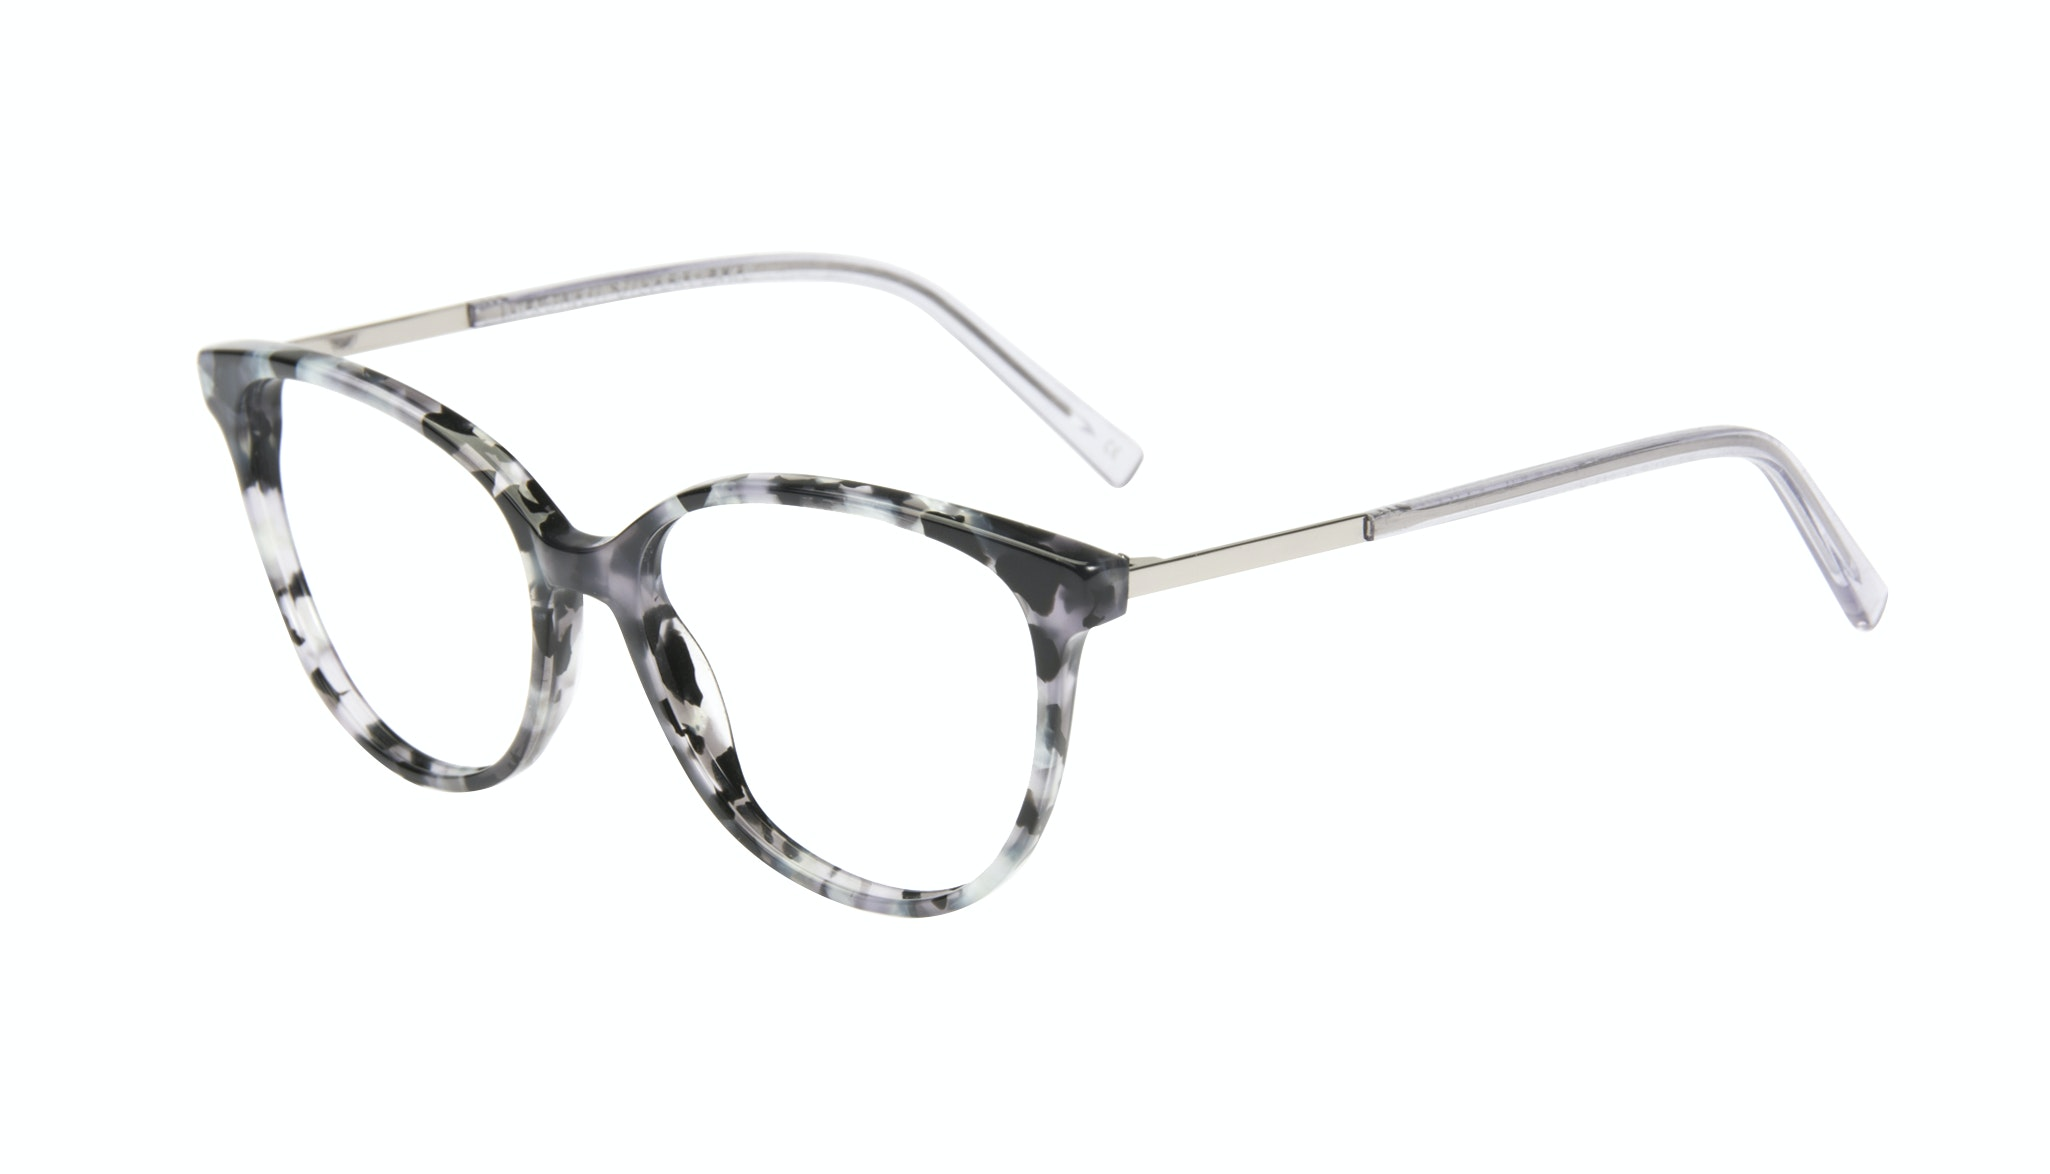 Affordable Fashion Glasses Cat Eye Eyeglasses Women Imagine II silver flake Tilt